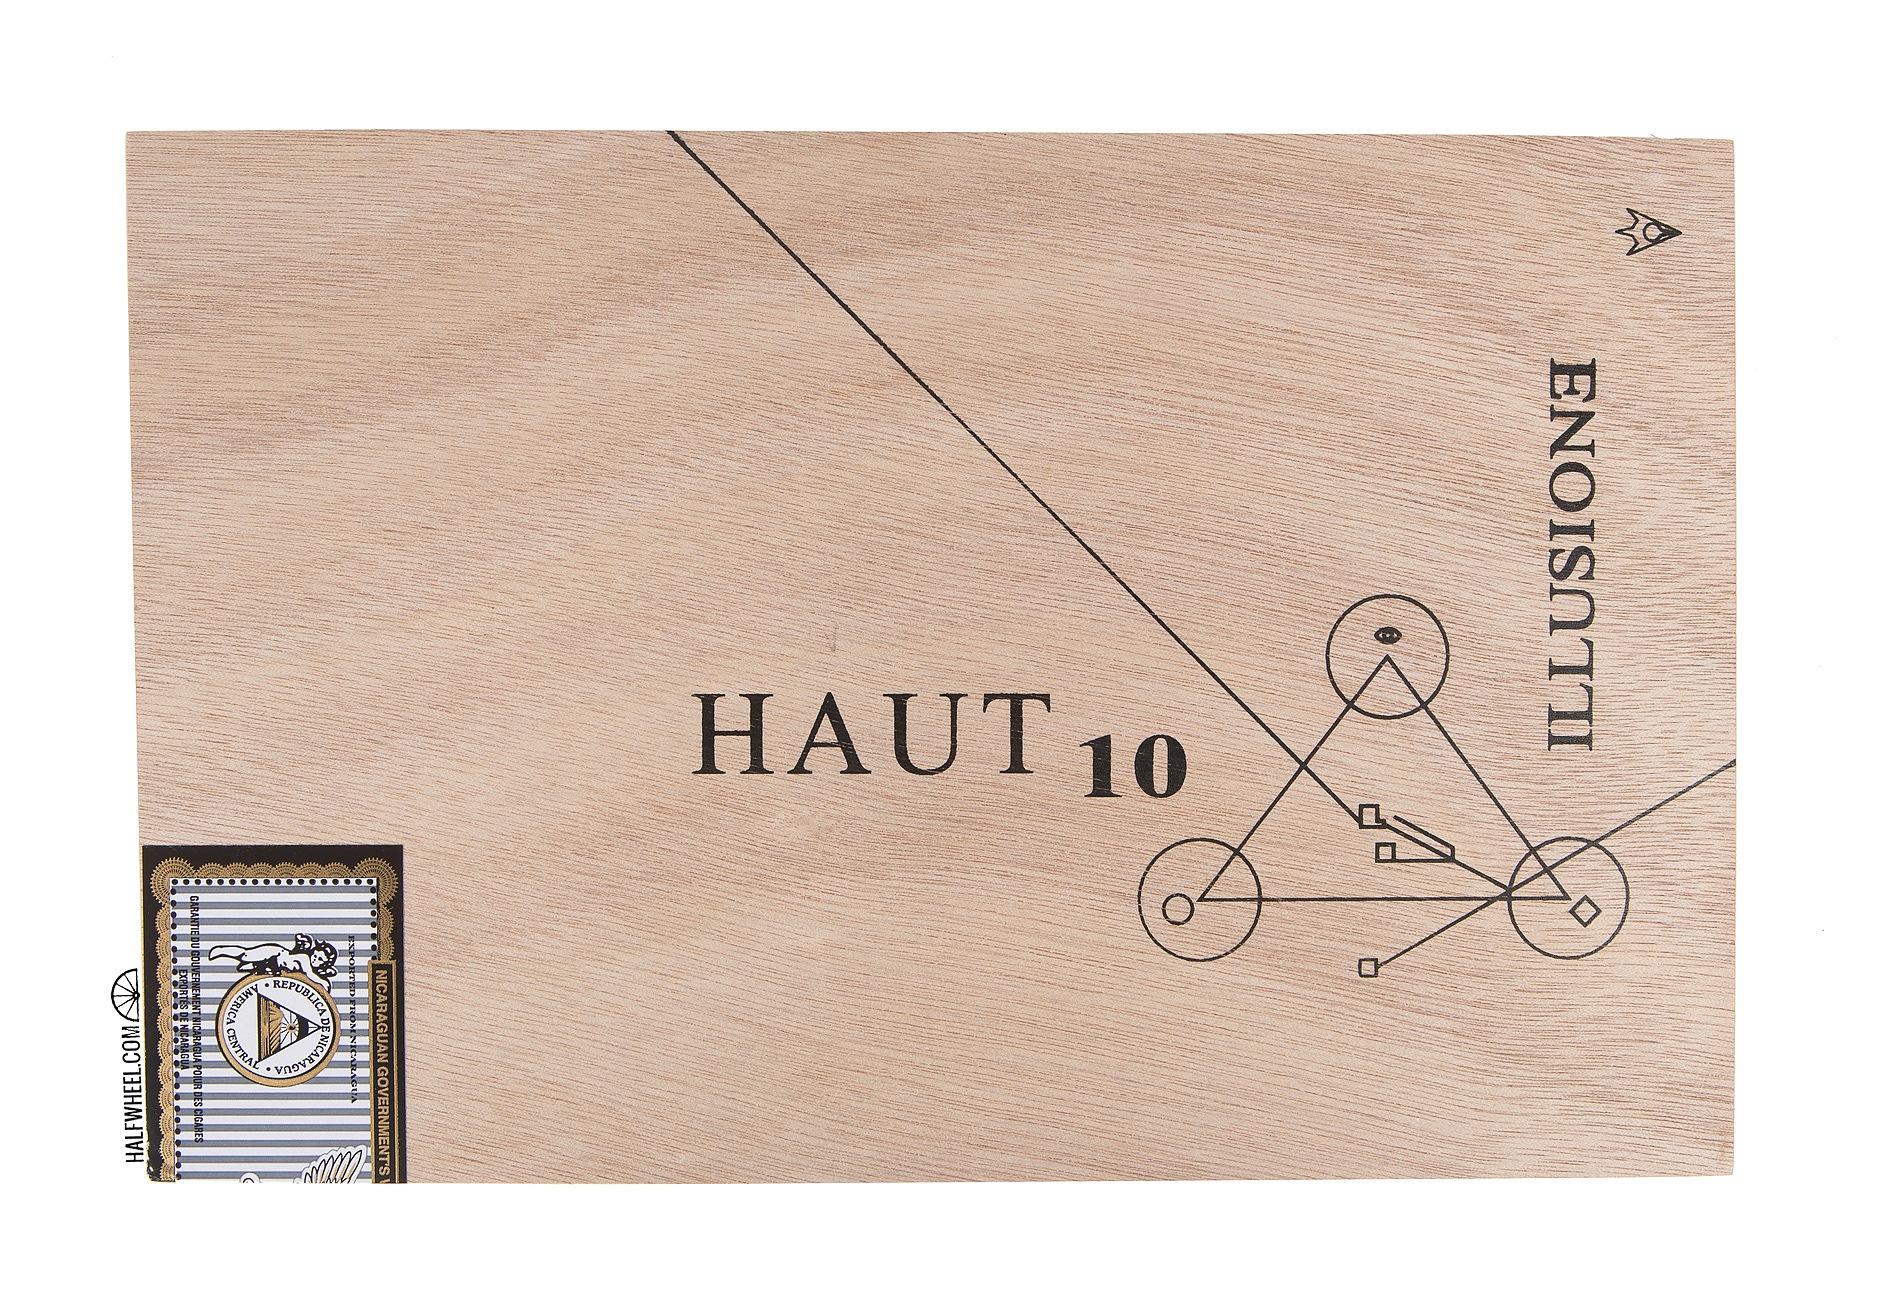 illusione-haut-10-box-top